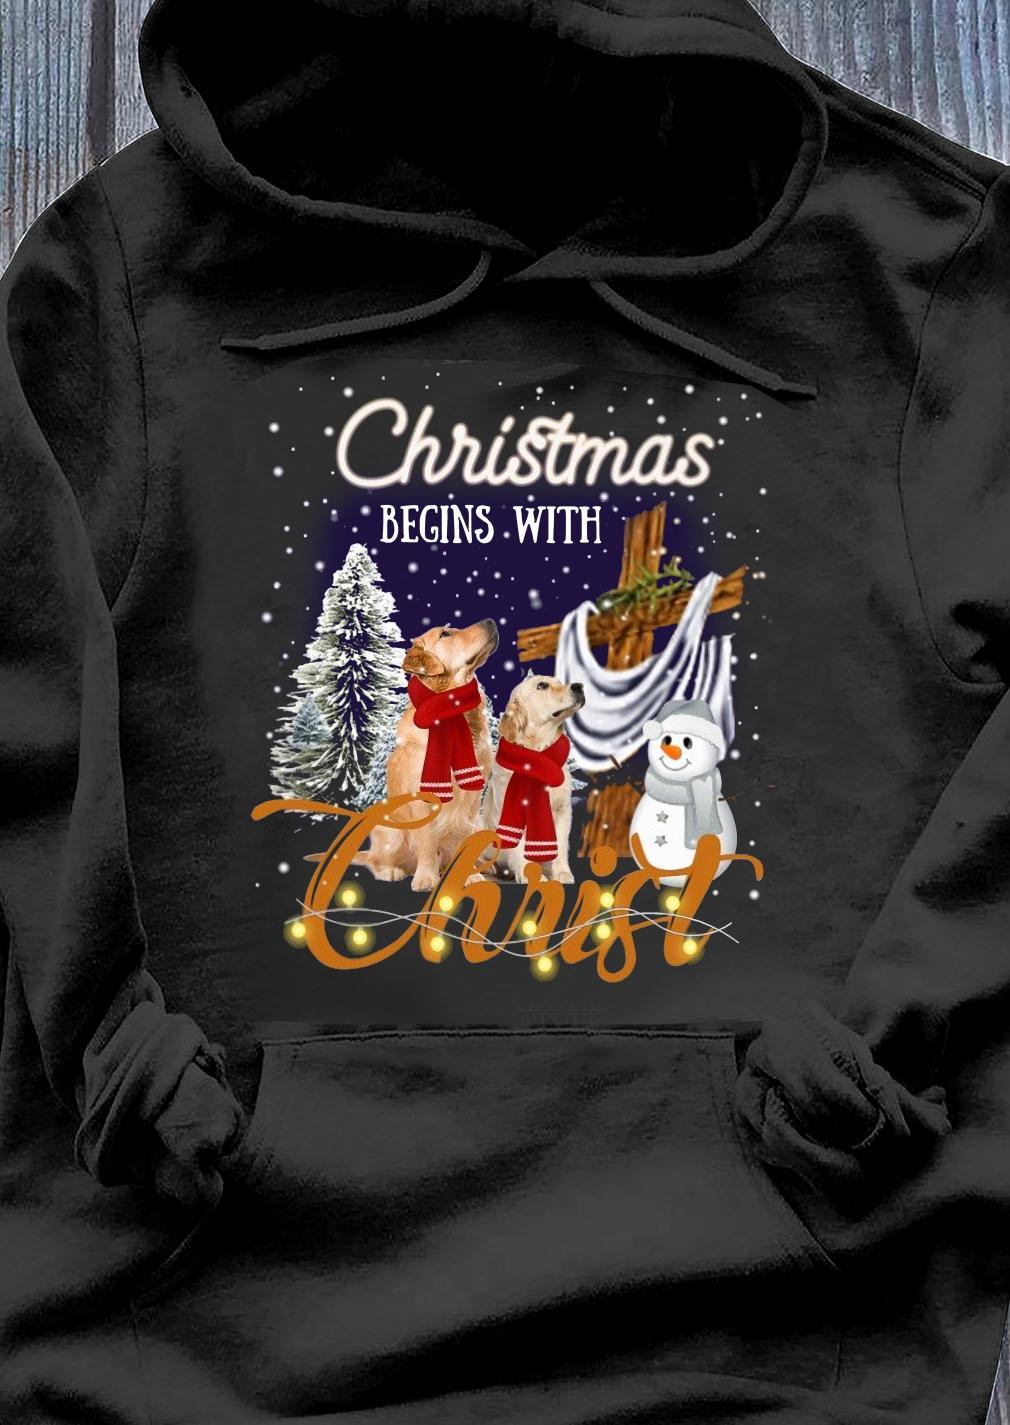 Golden Retriever Christmas Begins With Christ Crewneck Sweats Hoodie